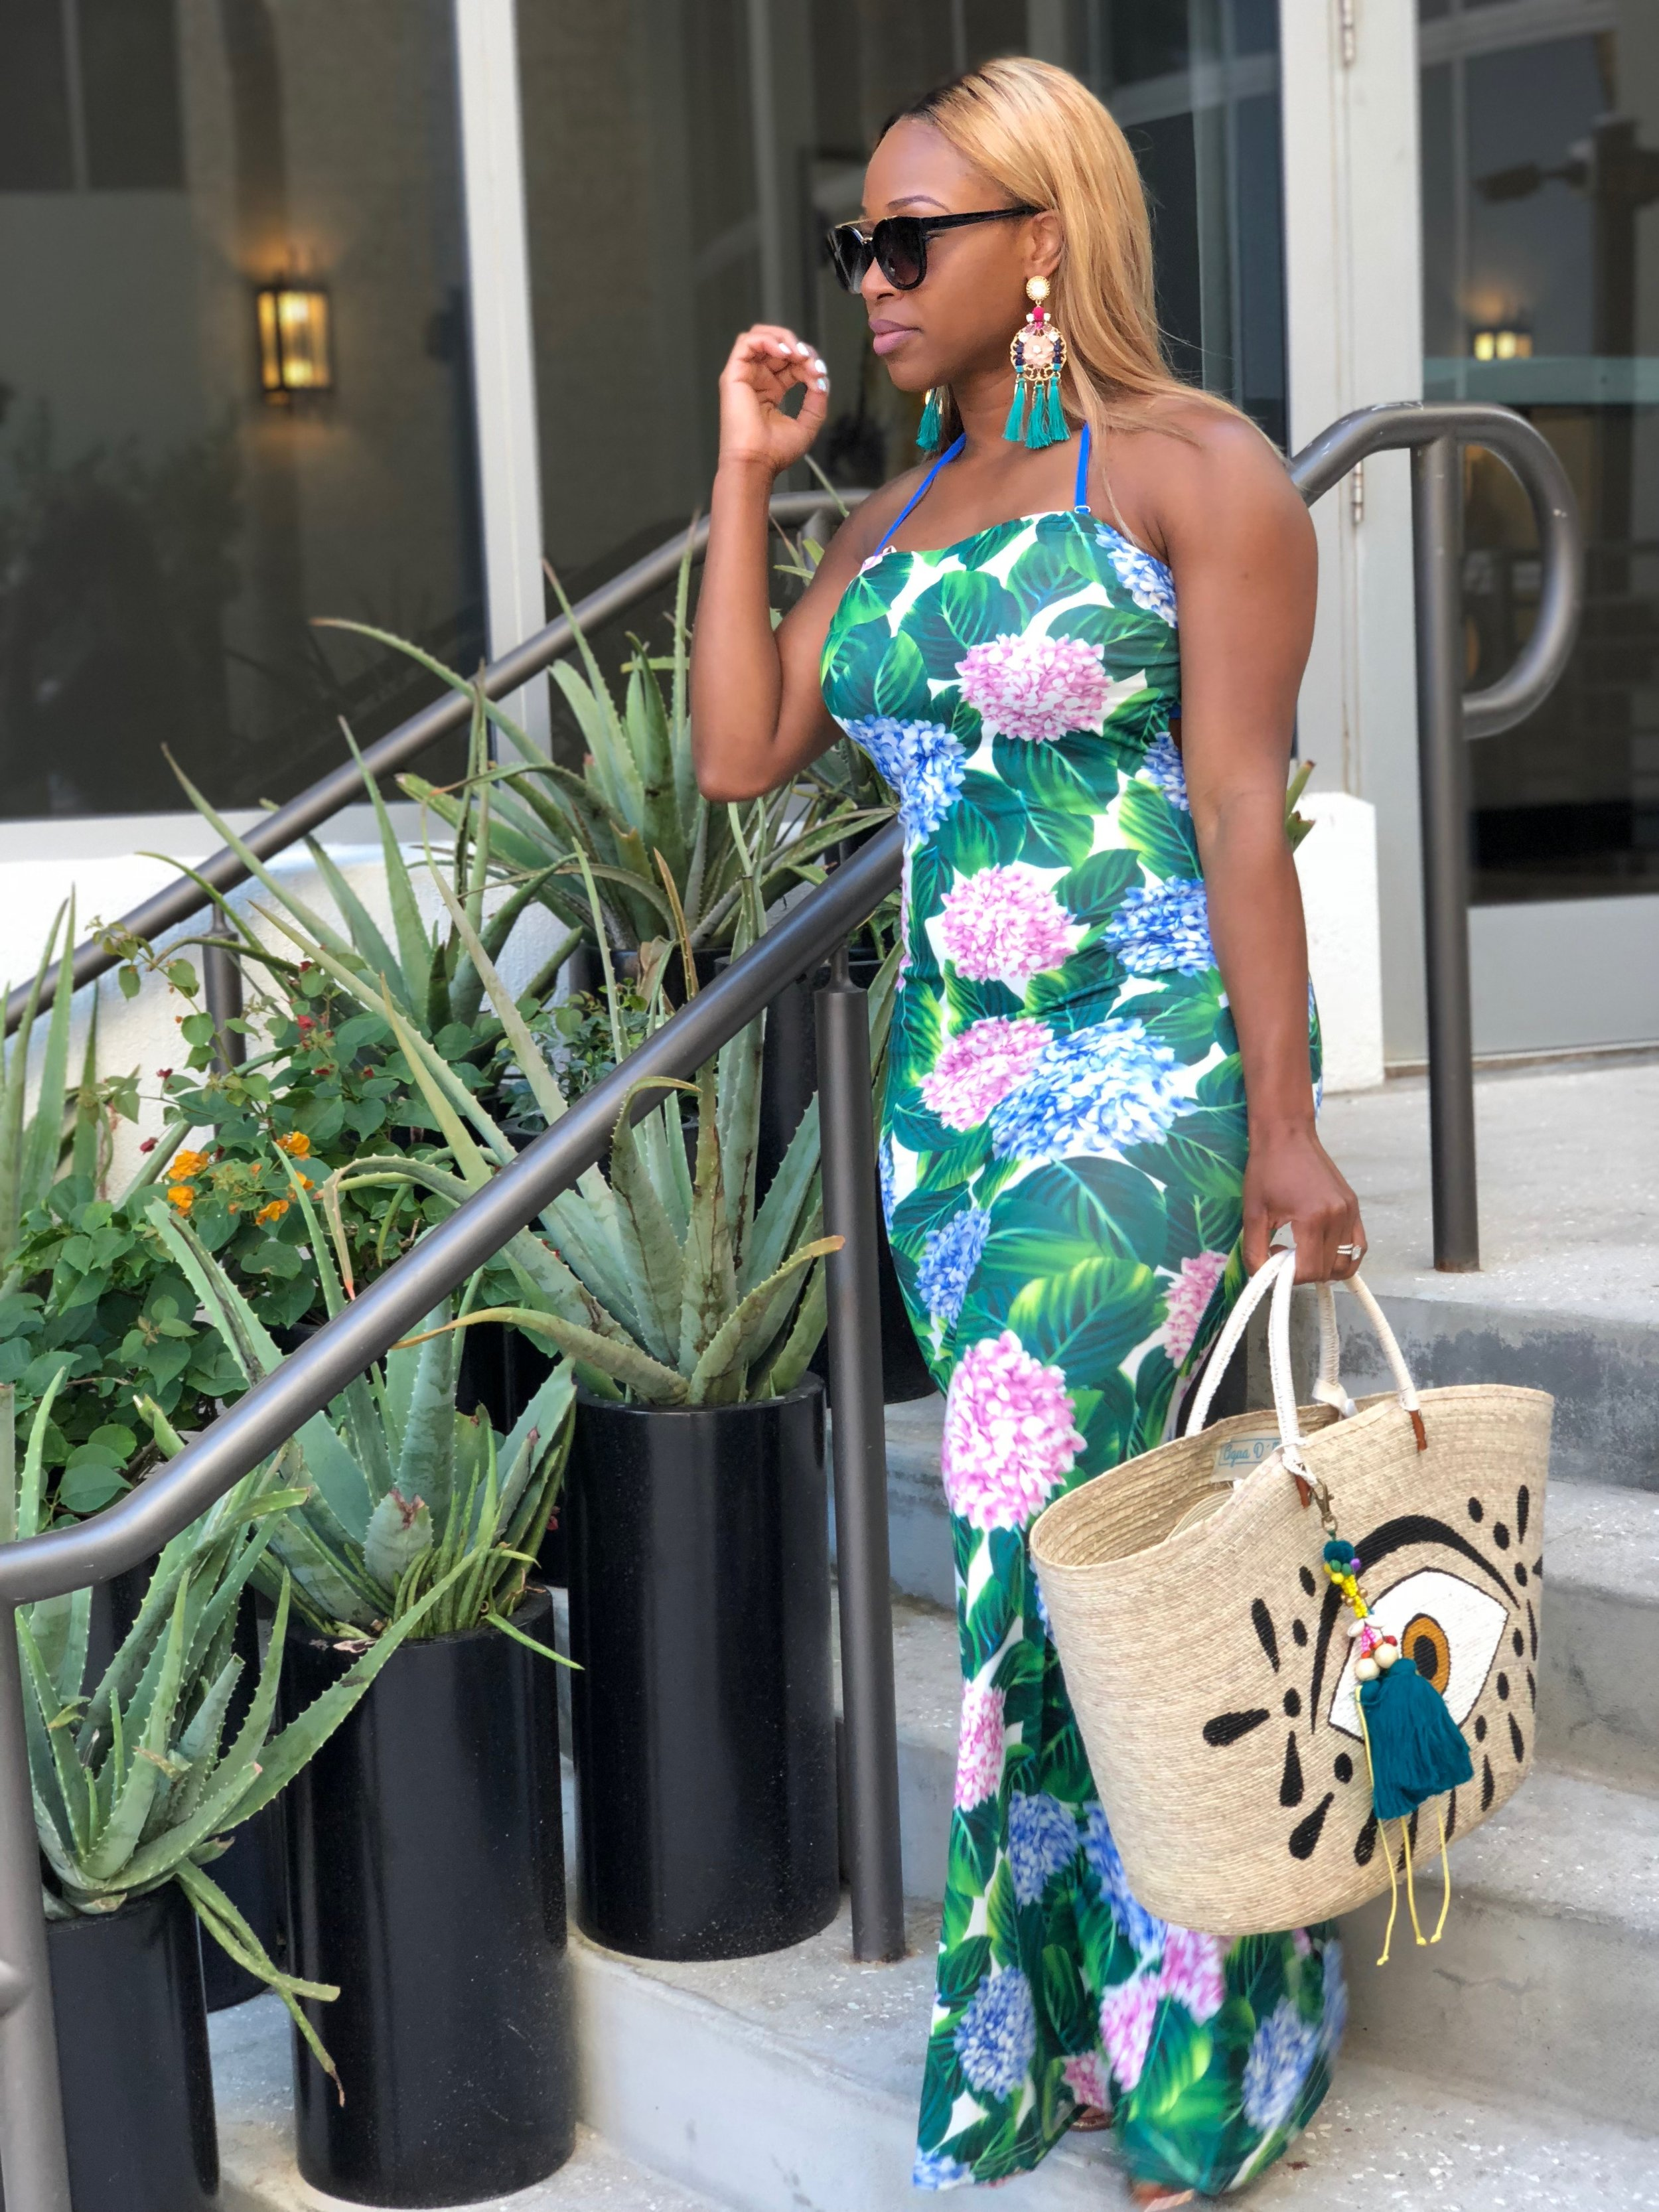 Location: Nobu Hotel Miami  Dress: Gitionline  Earrings: Also accessories  Sunglasses: Boohoo  Beach Bag: Aqua Dumar Boutique (inside Nobu Hotel Miami)